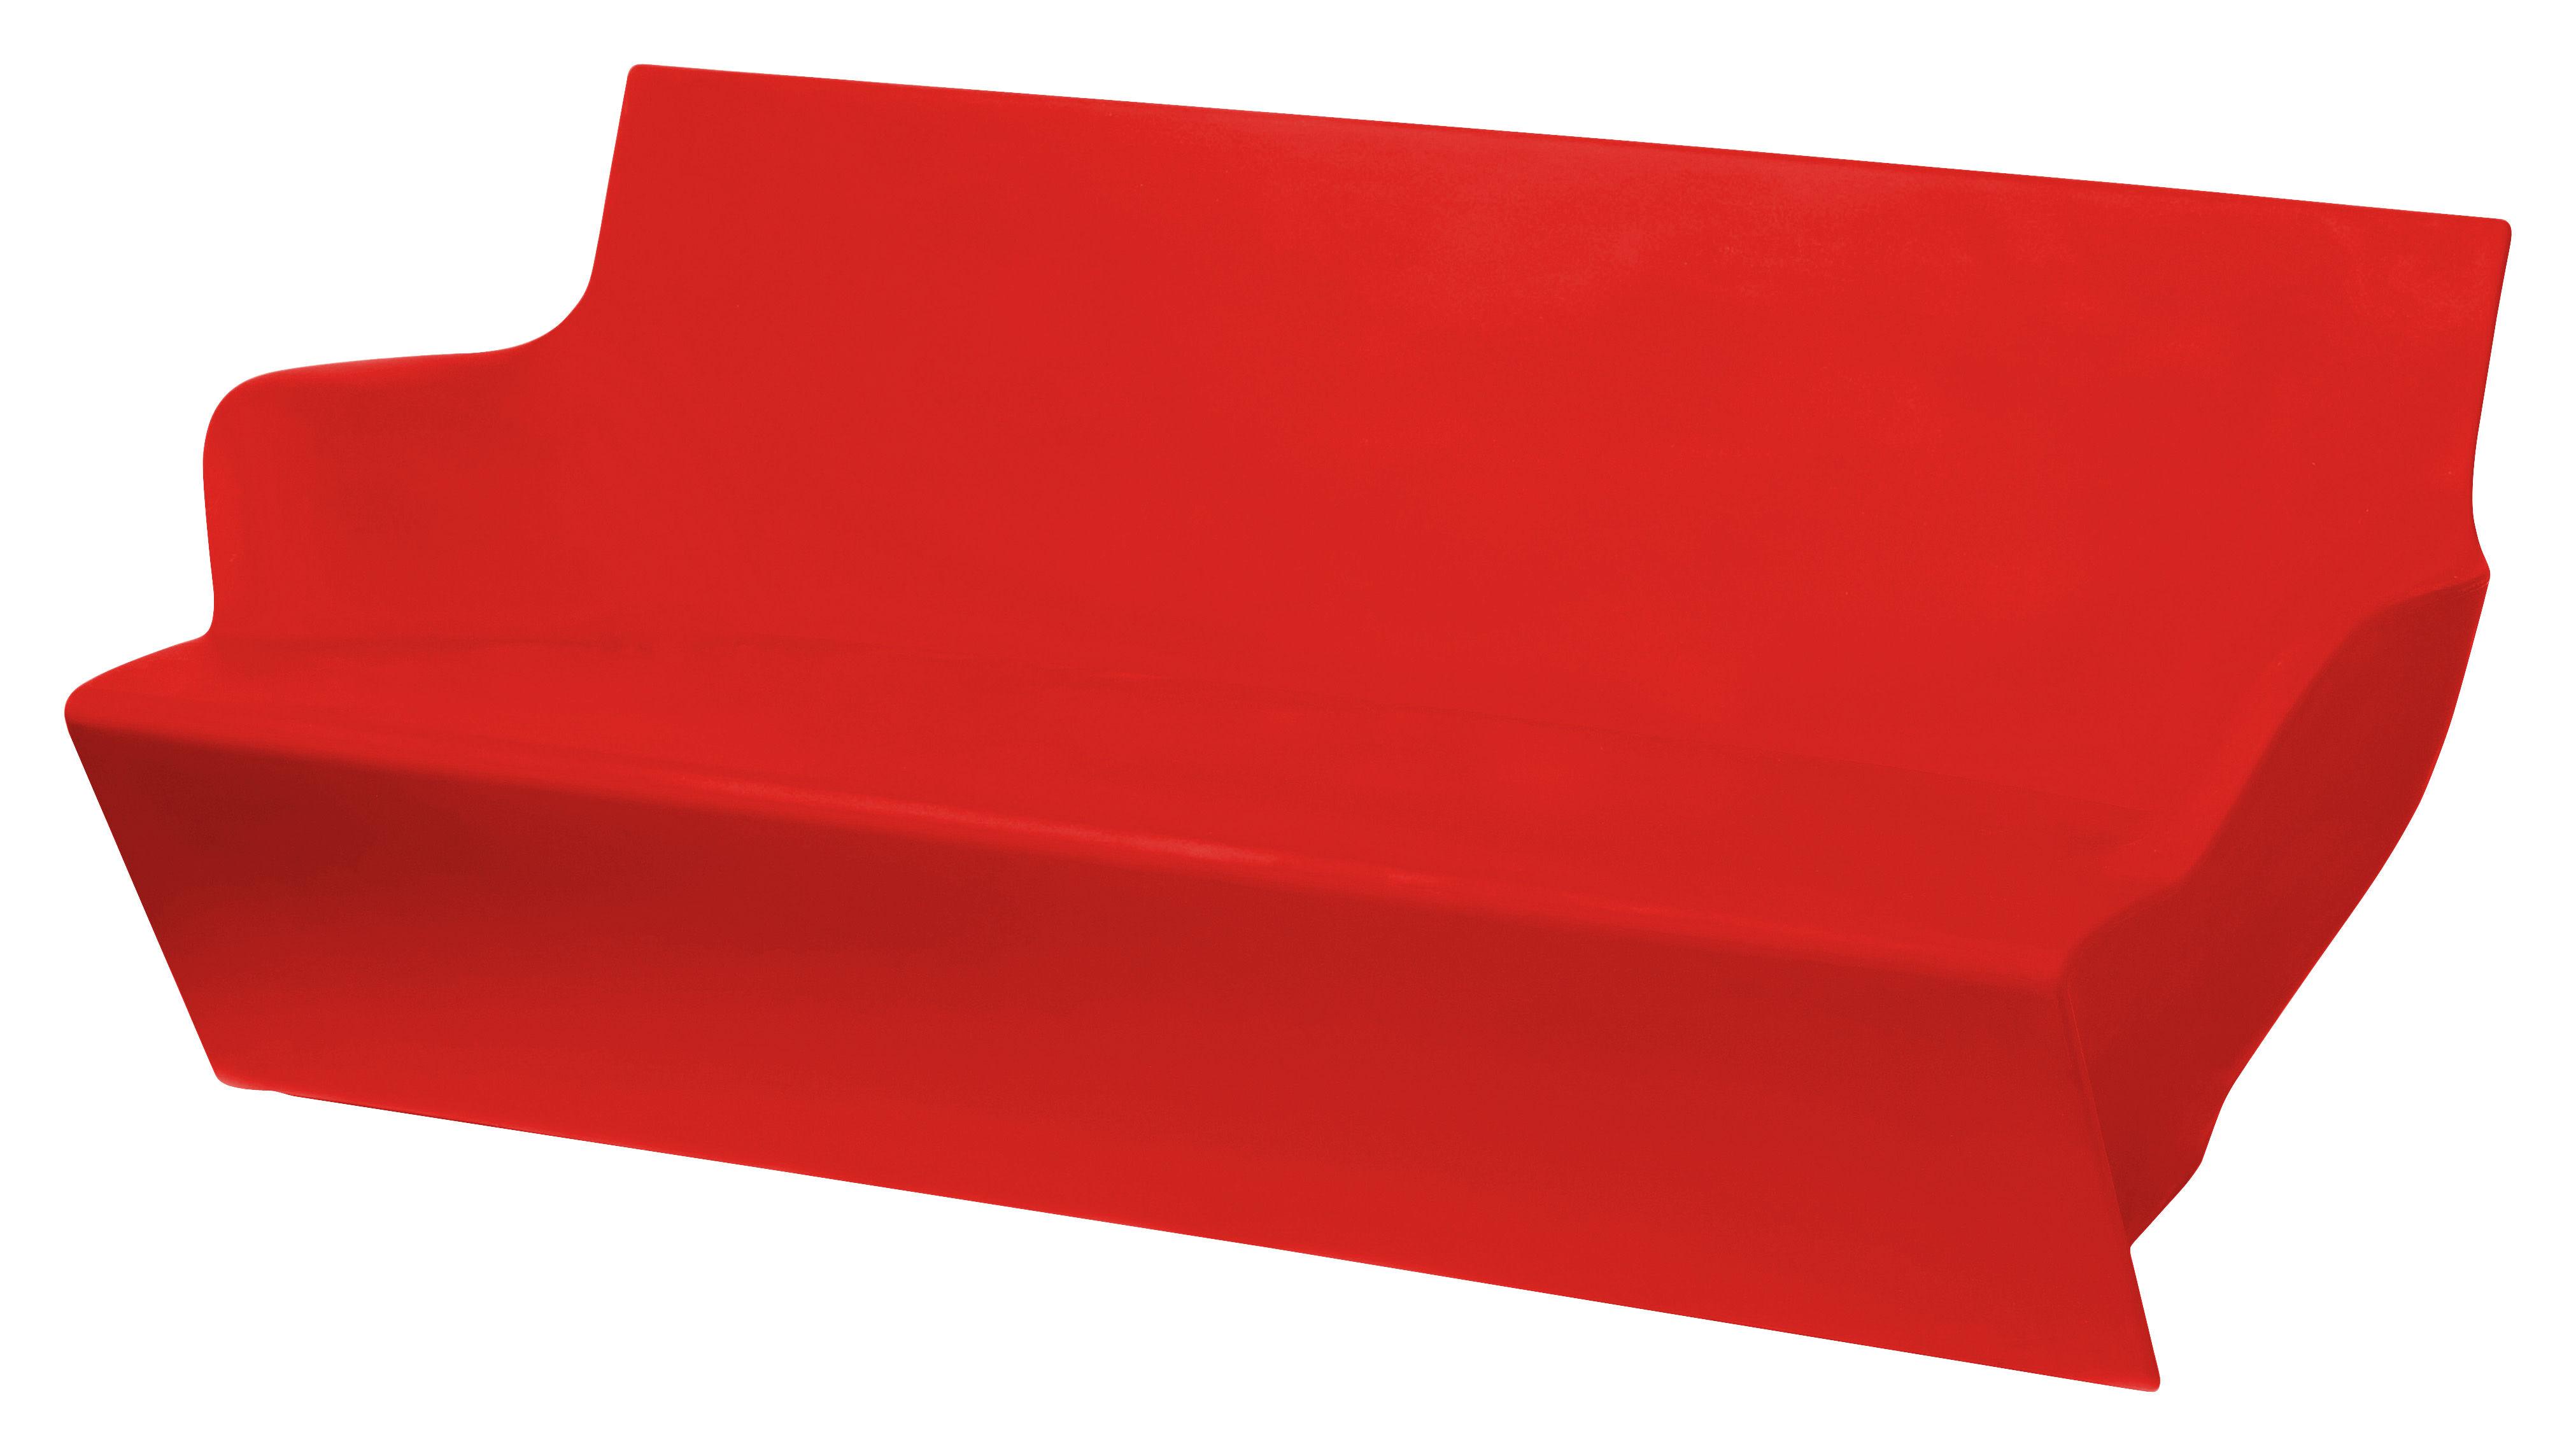 Outdoor - Sofas und Lounge Sessel - Kami Yon Sofa - Slide - Rot - recycelbares Polyethen